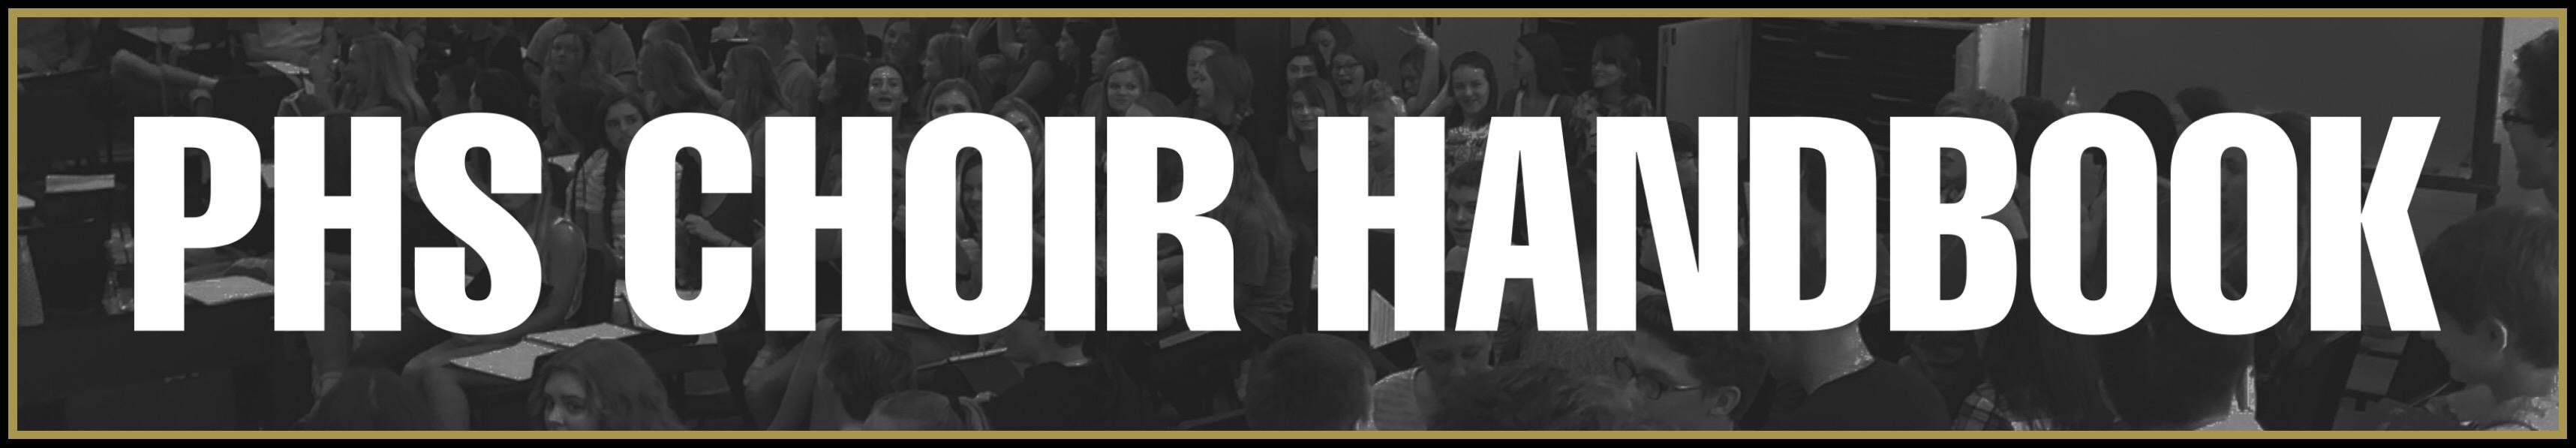 PHS Choir Student Handbook (click to download)